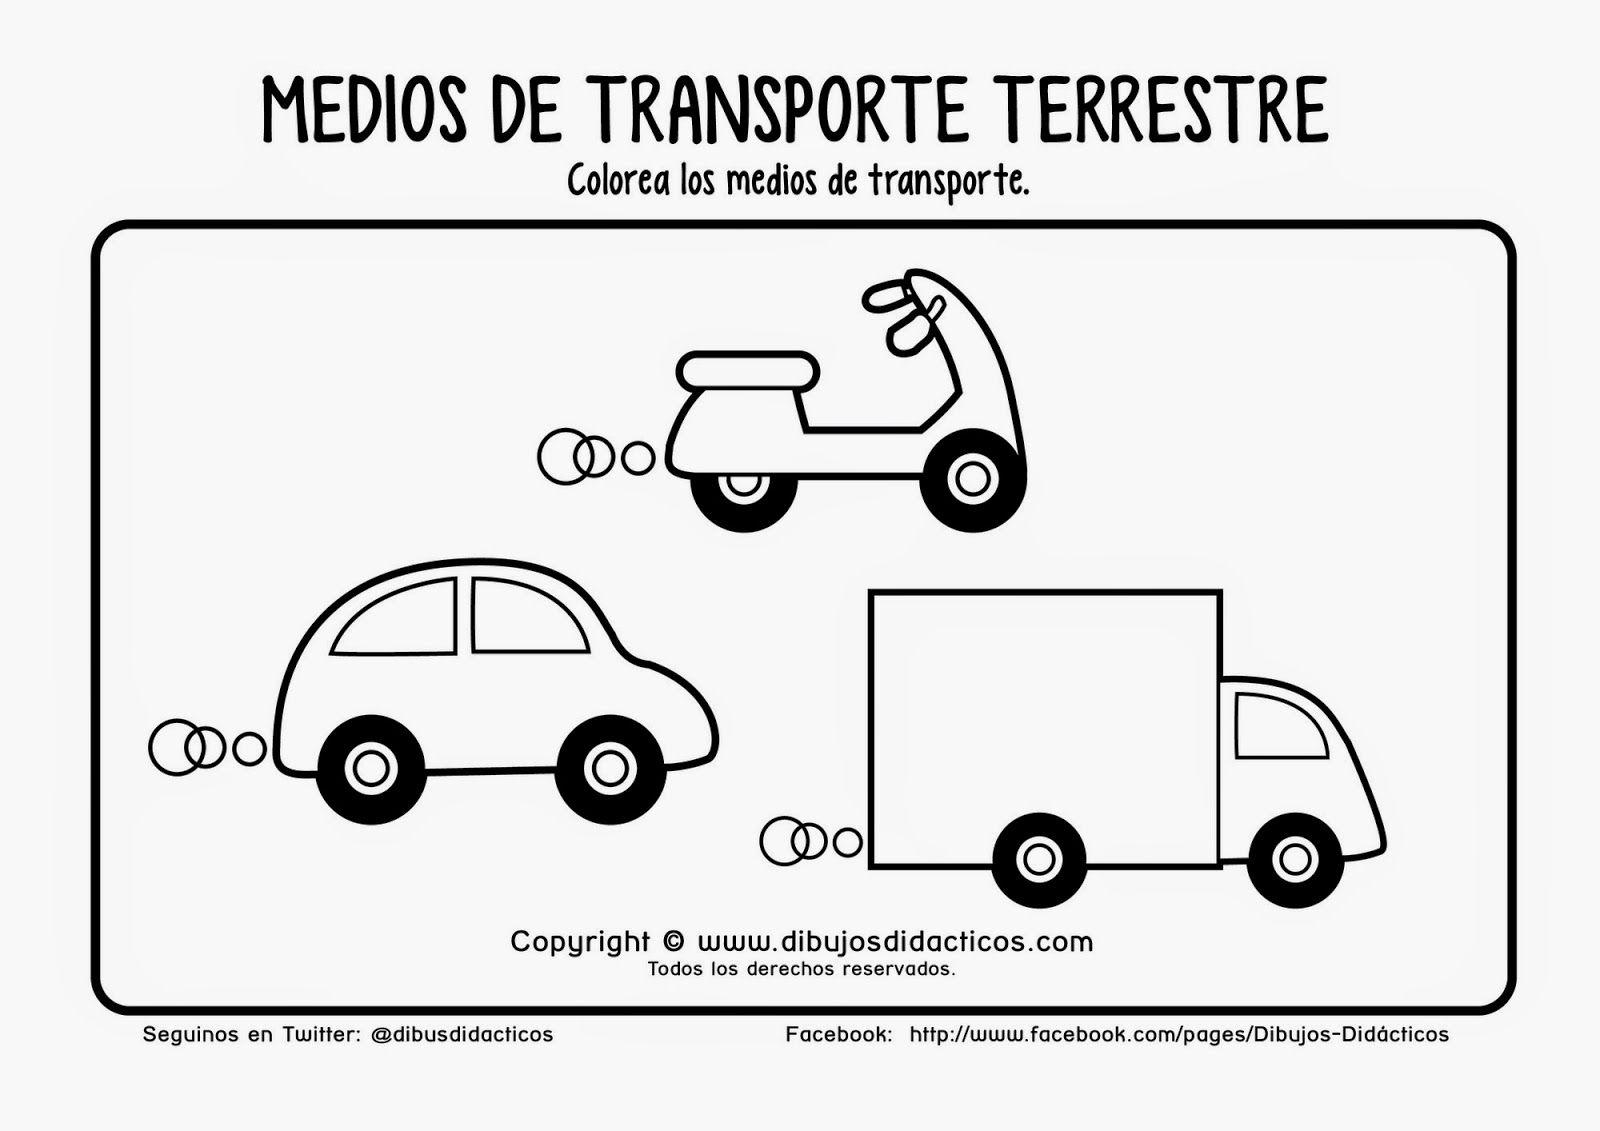 Dibujo Colorear Medios De Transporte Dibujos Didacticos 04 20130121 1404806094 Jpg 1600 1131 Transporte Preescolar Transporte Medios De Transporte